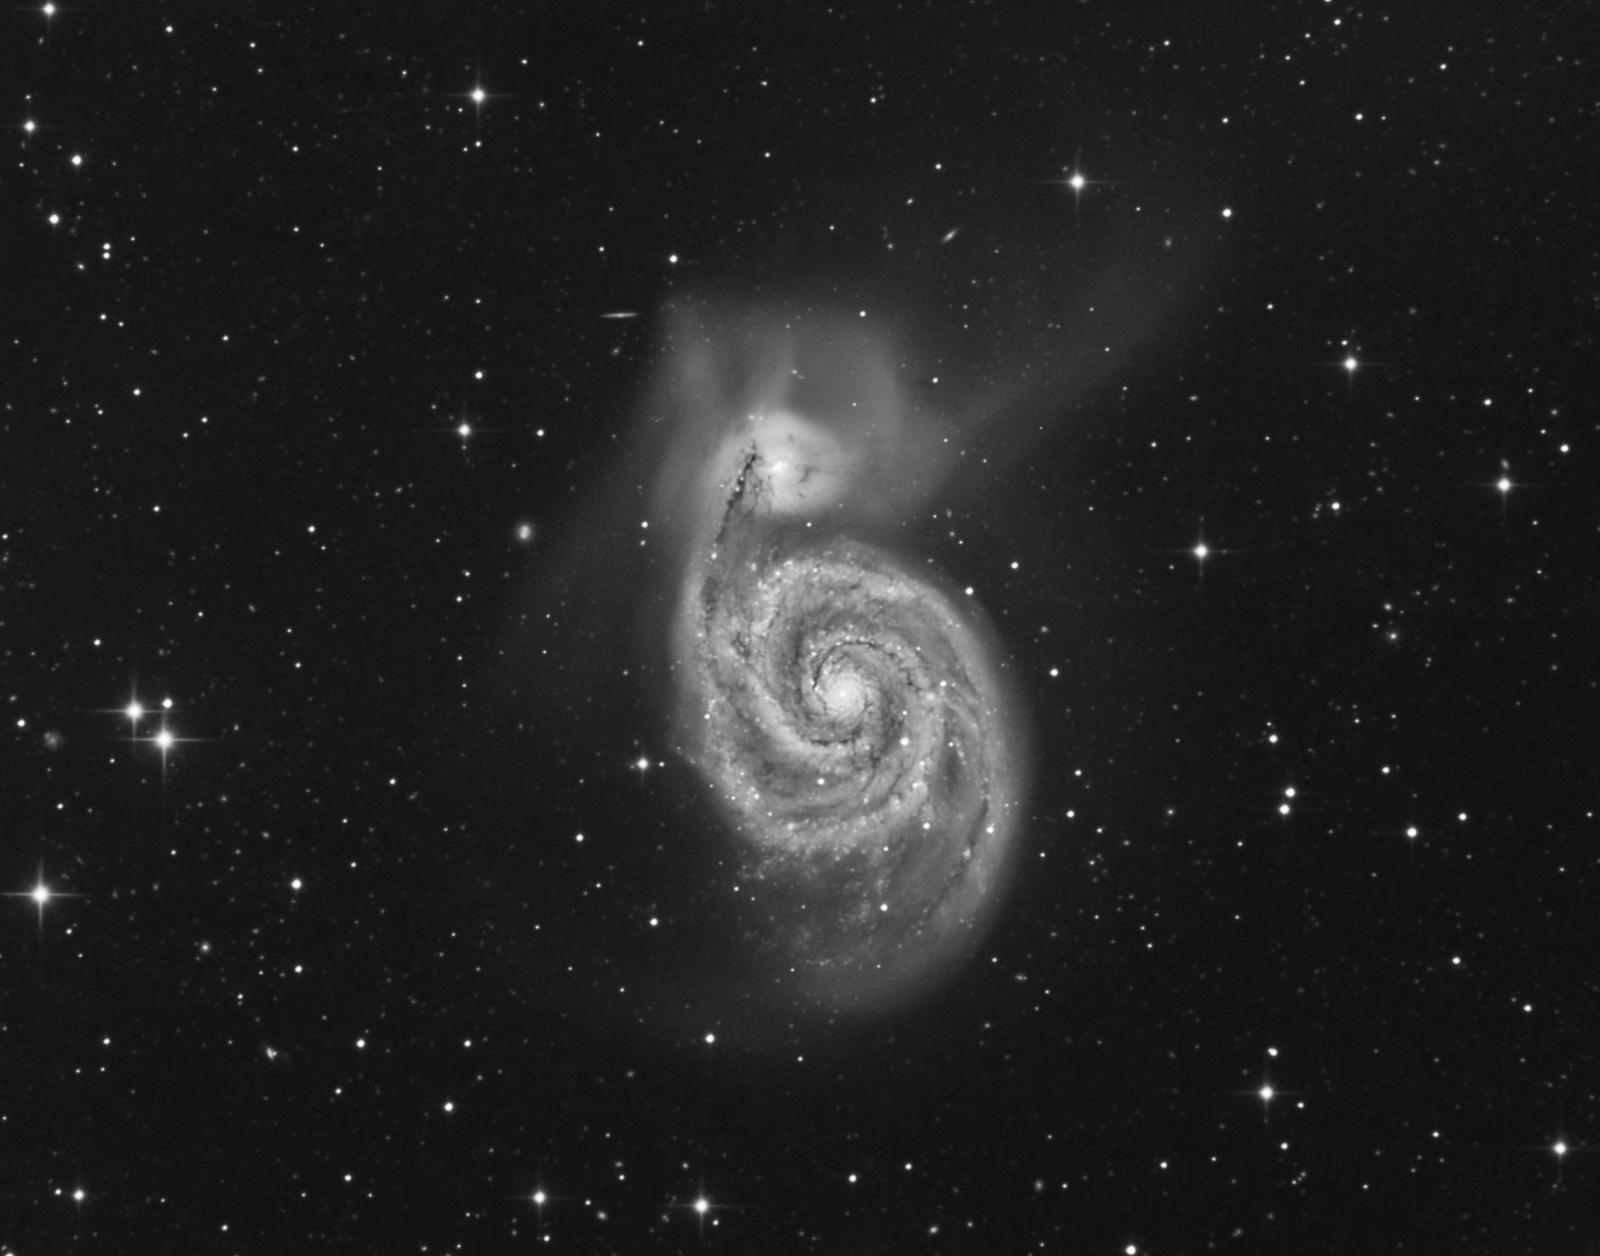 M51_Luminancja.thumb.jpg.38c277c284cc91c9beb03e7a608cd583.jpg